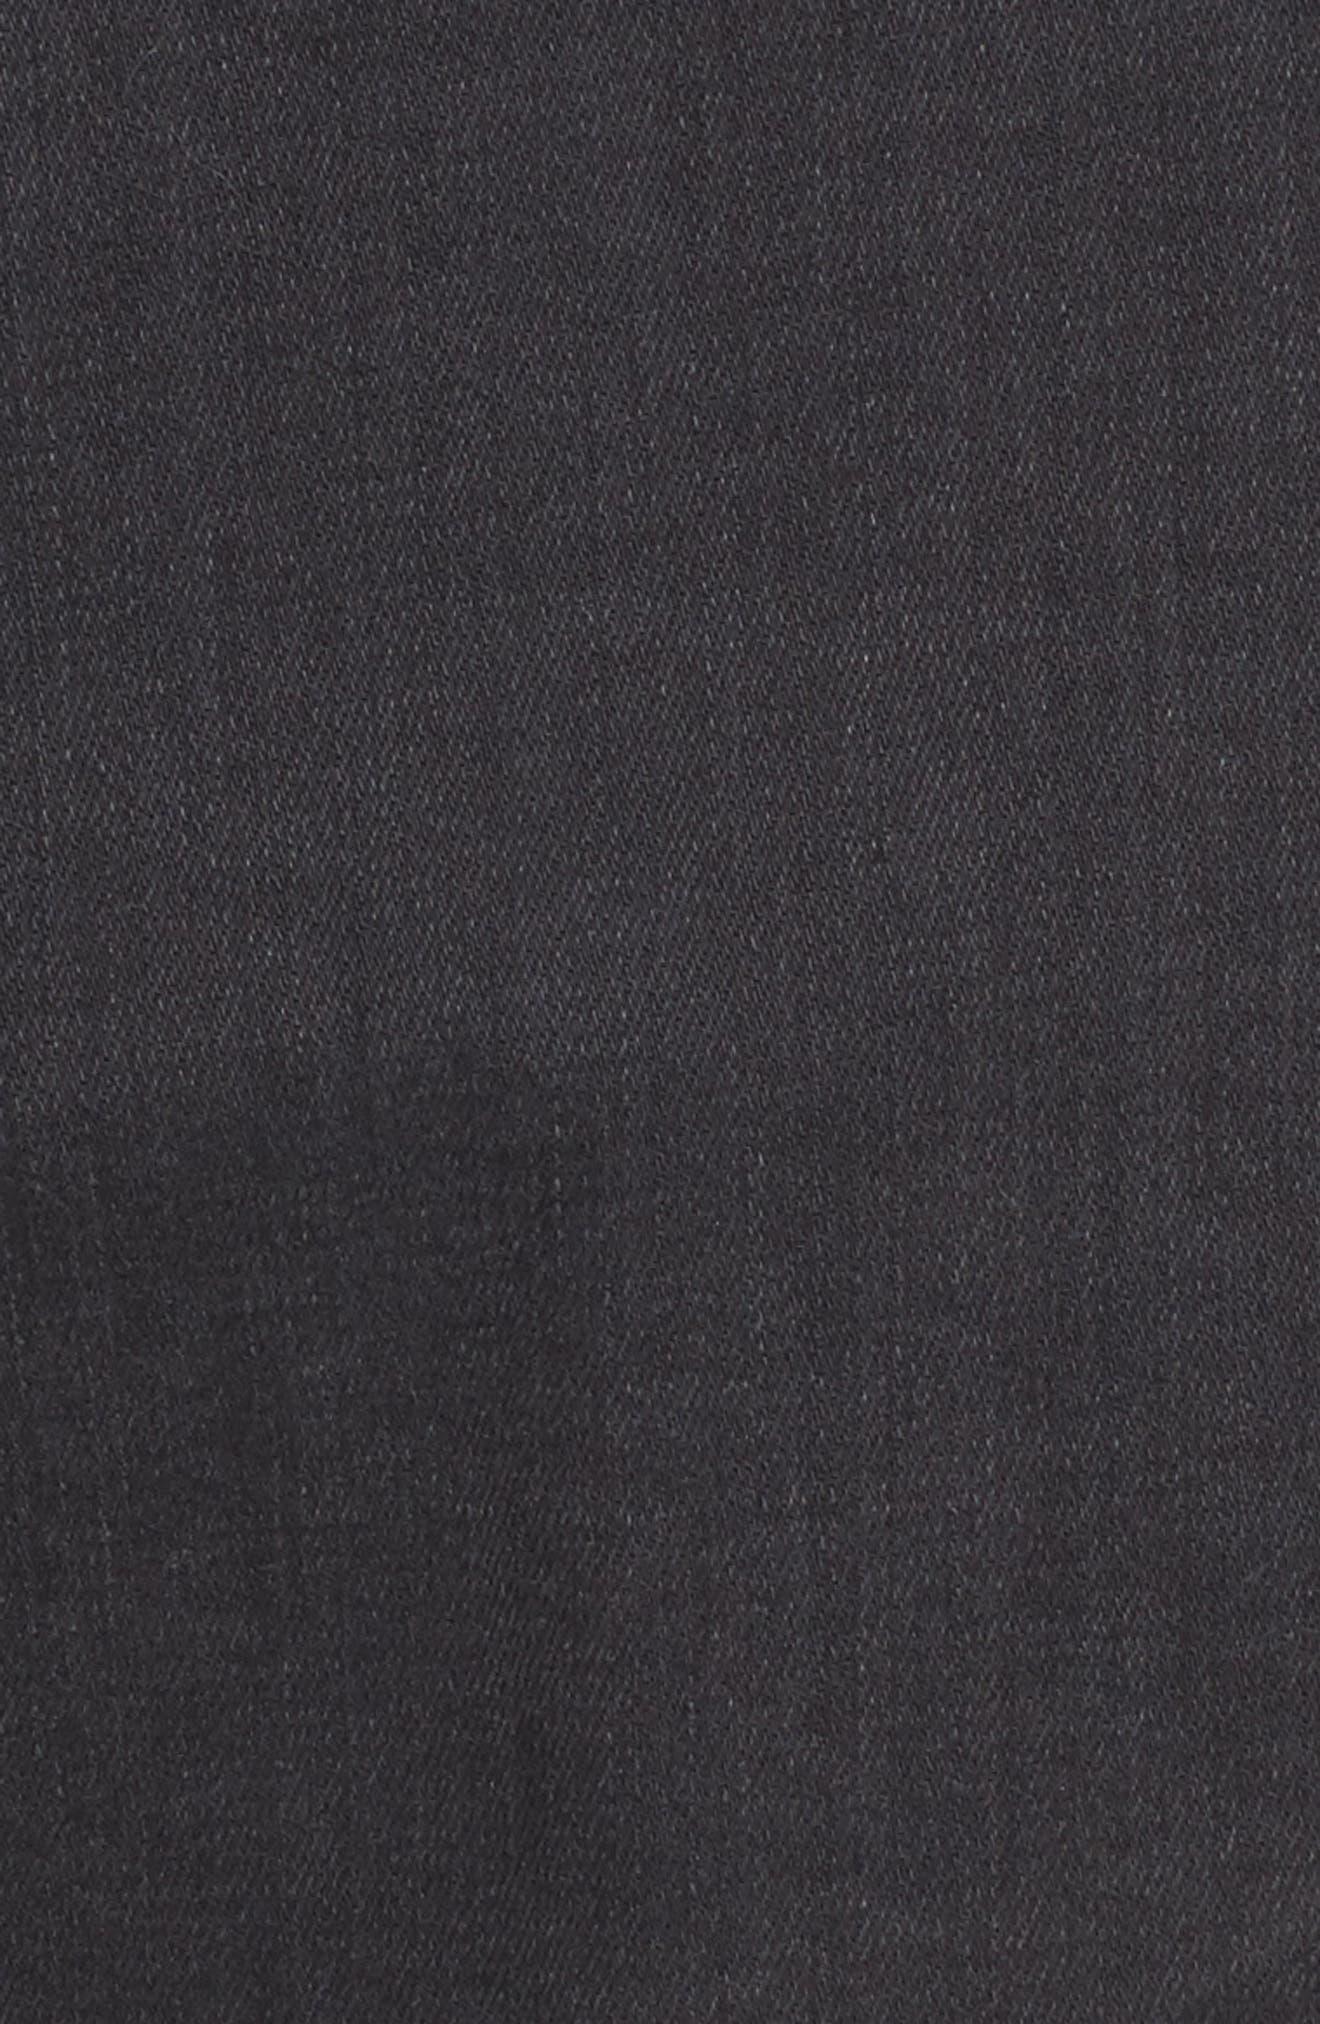 'Robyn' Crop Denim Jacket,                             Alternate thumbnail 6, color,                             014